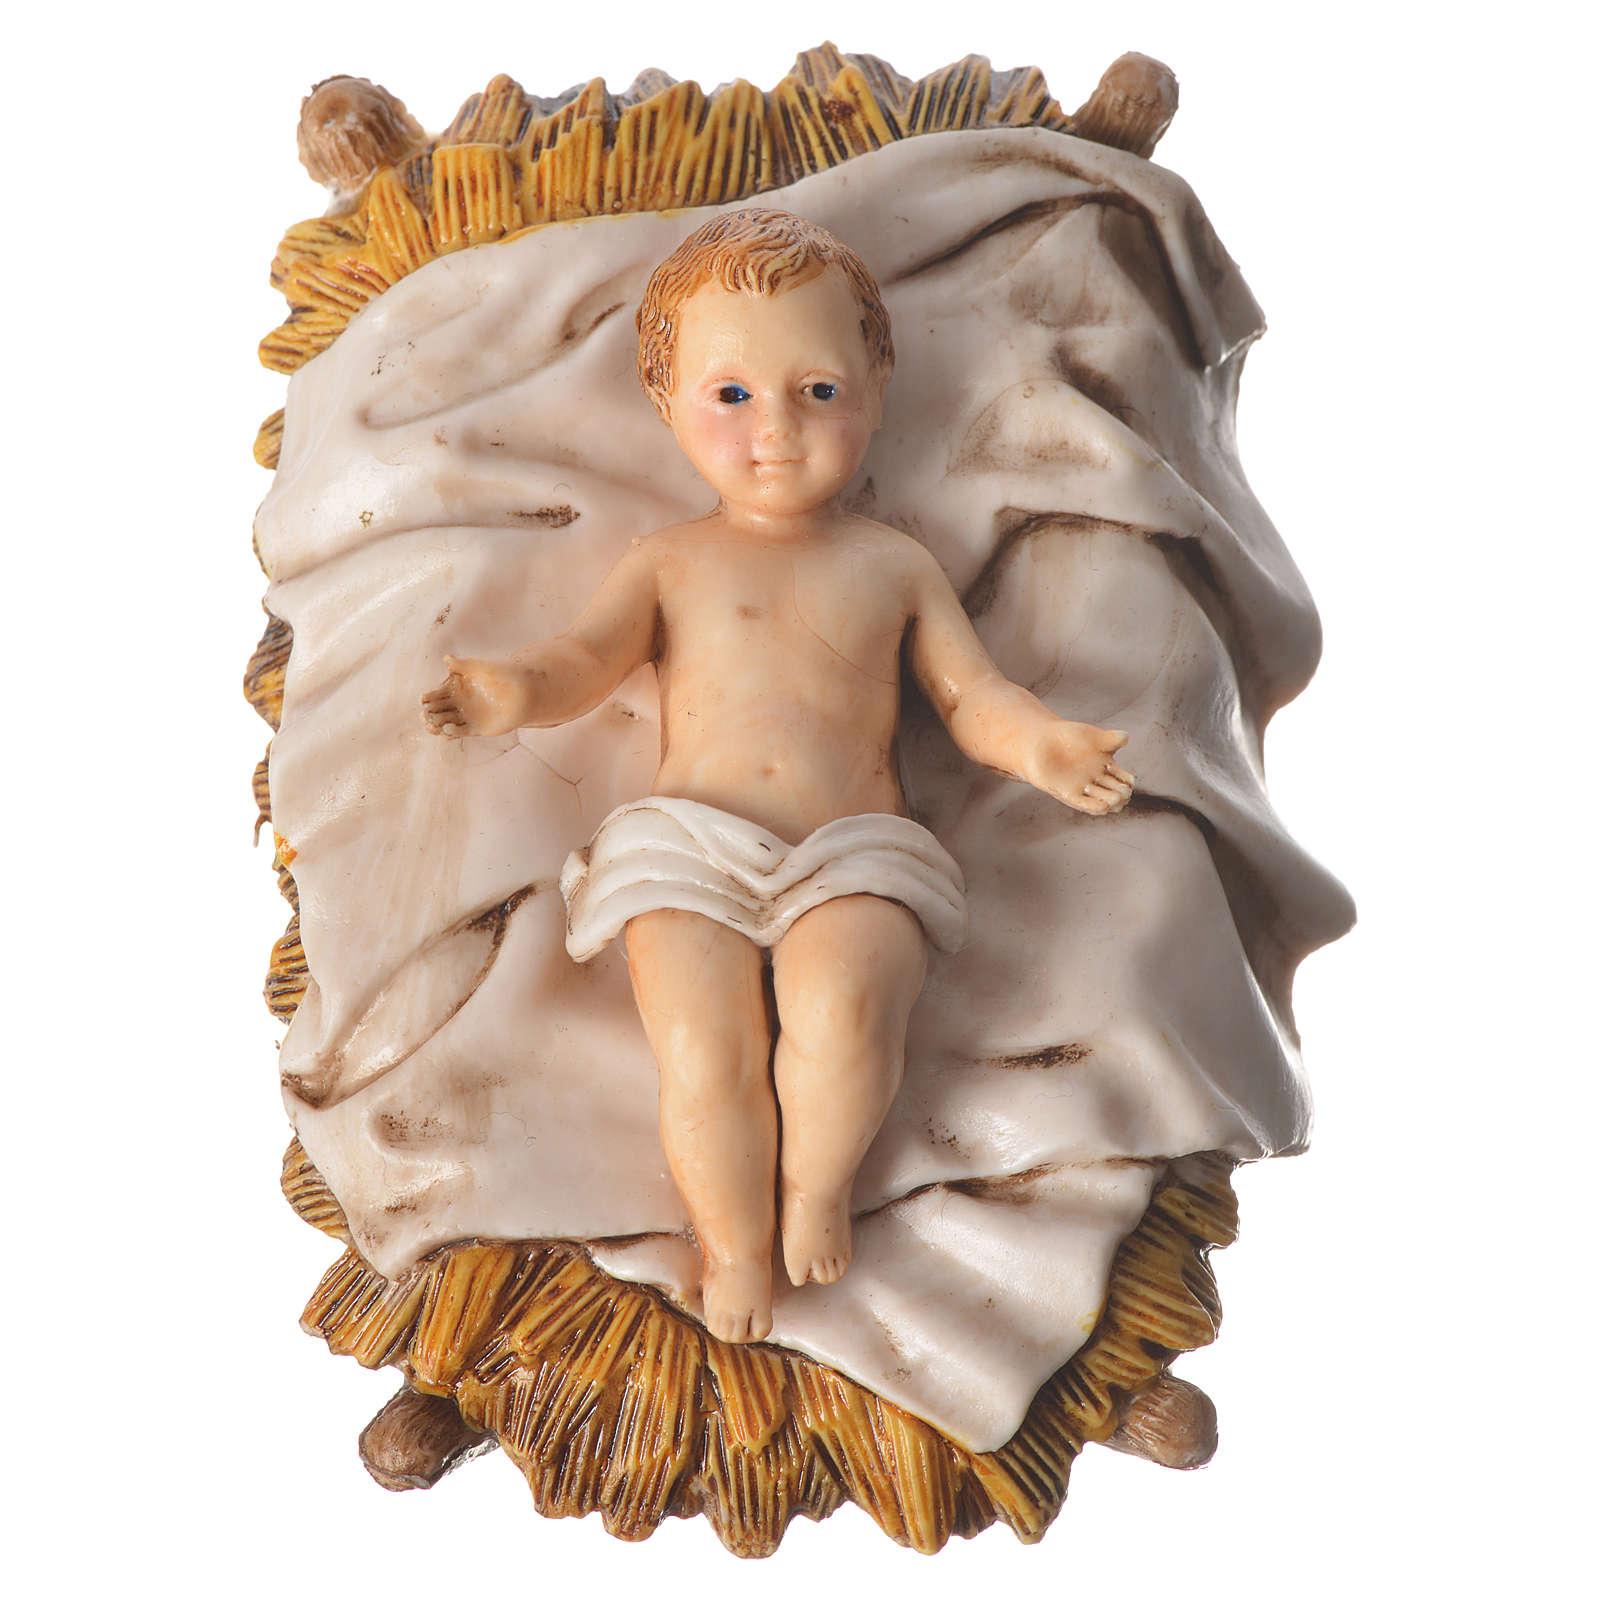 Natividad 13 cm belén Moranduzzo 6 figuras 4